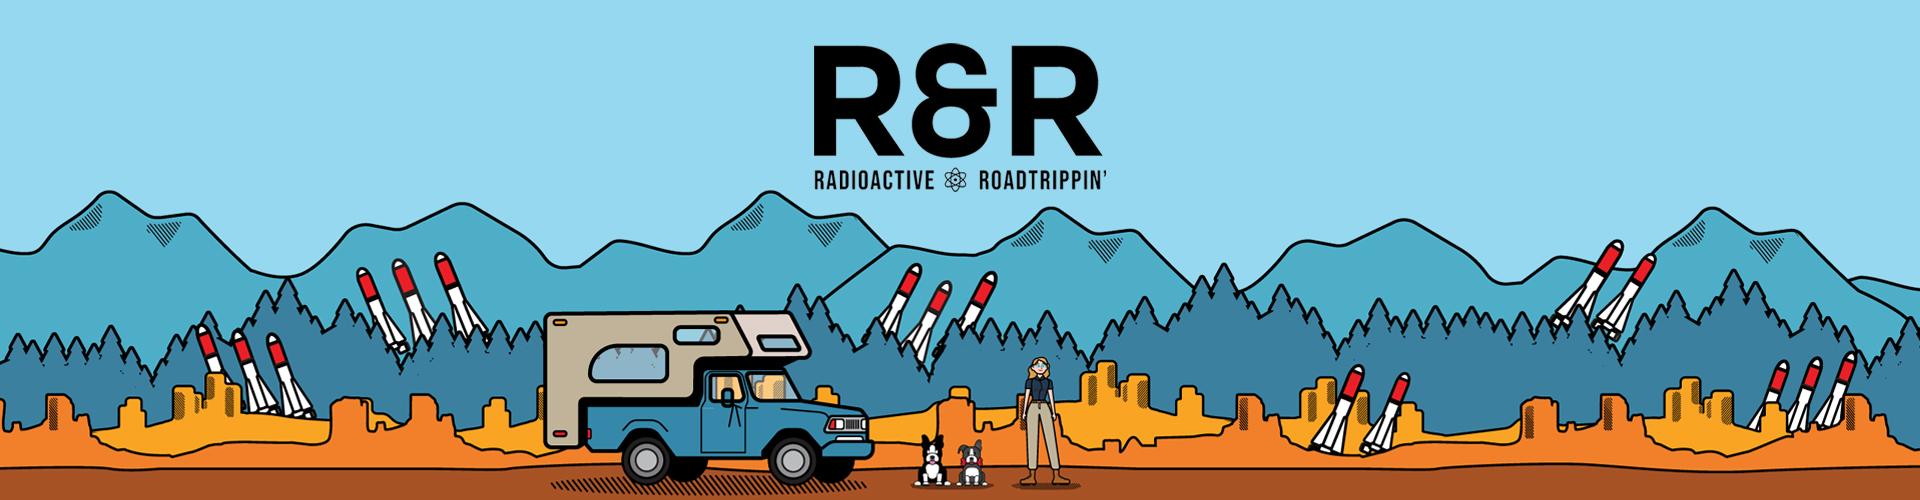 R&R slider